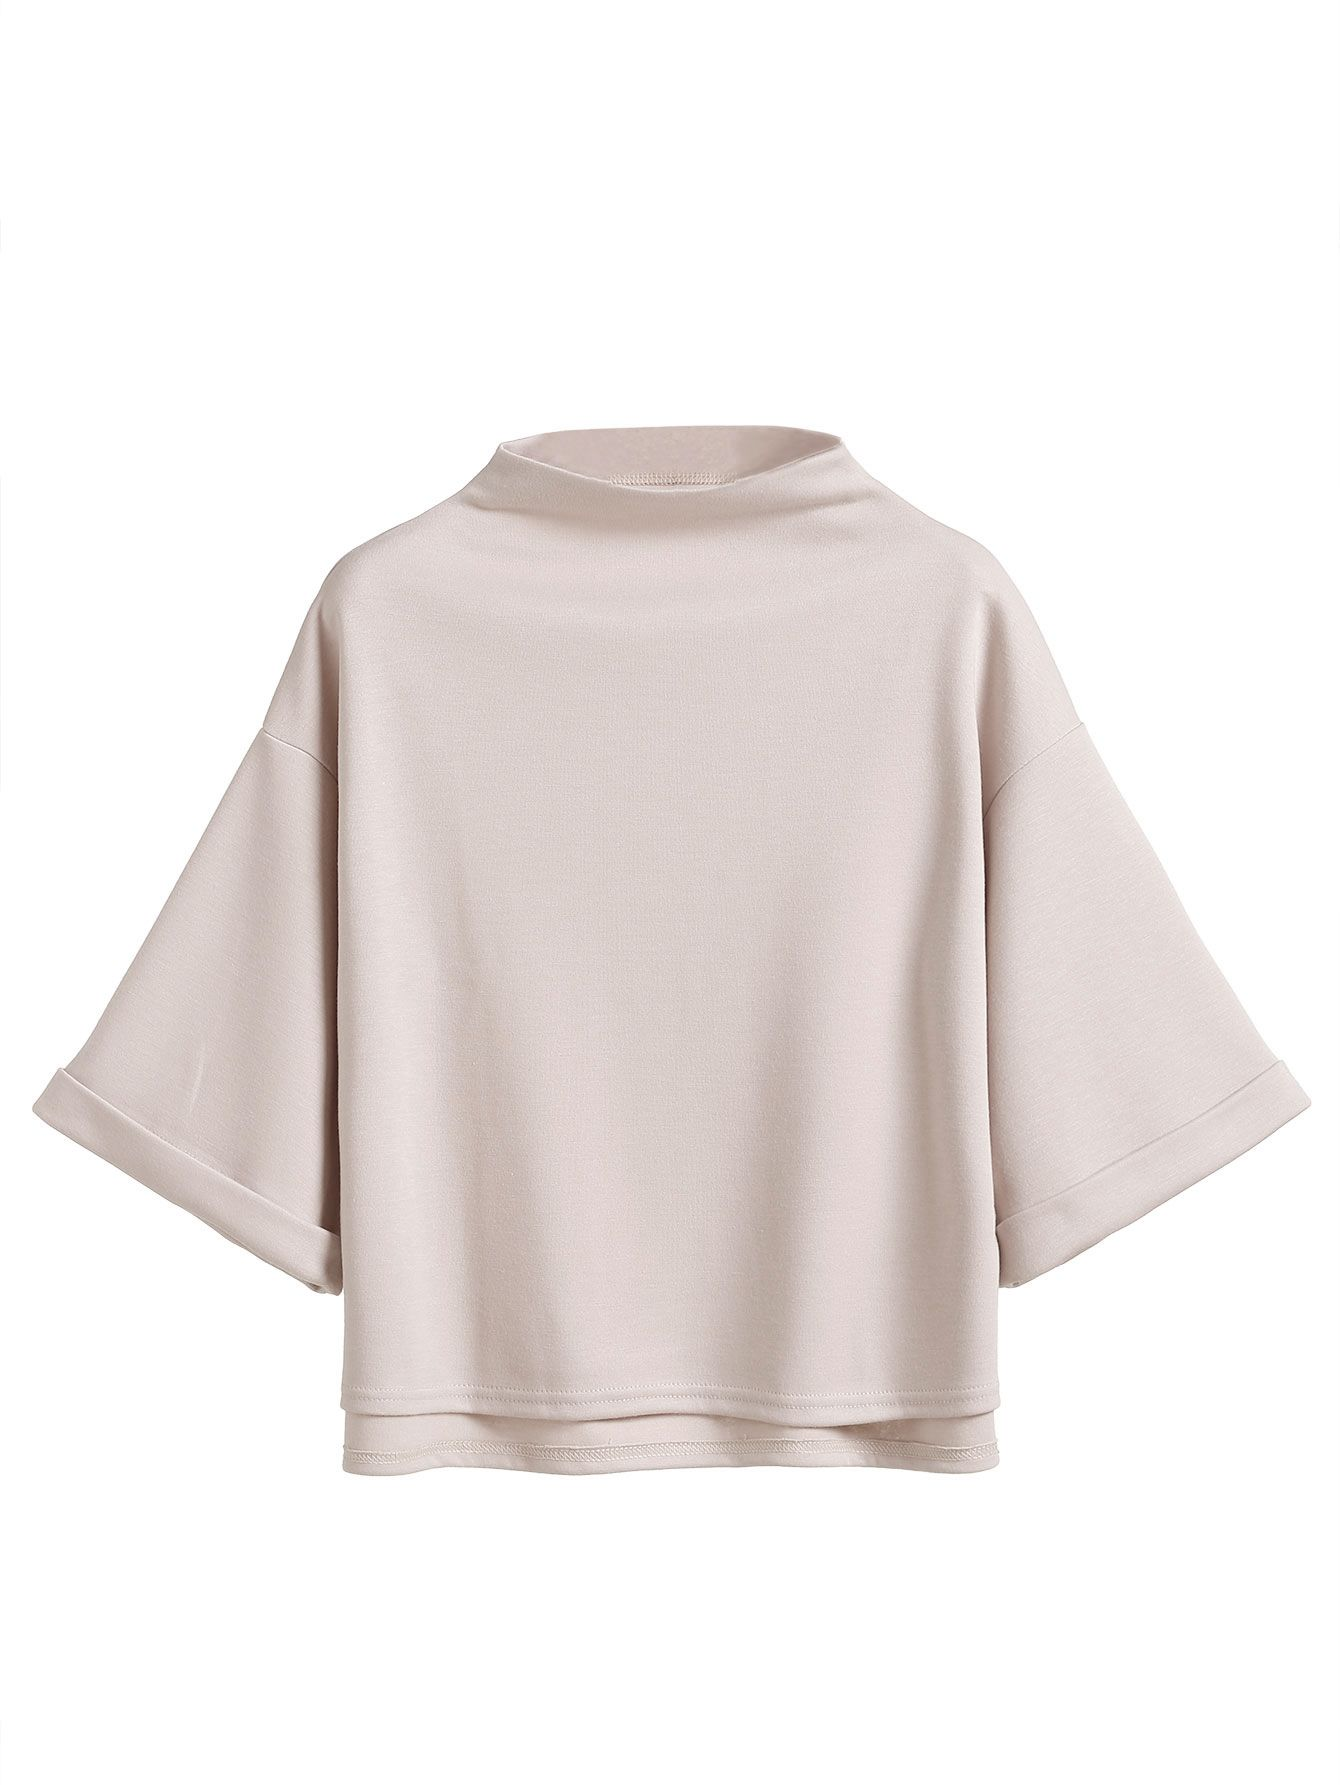 afcf4211 Shop Mock Neck Drop Shoulder High Low Cuffed T-shirt online. SheIn offers Mock  Neck Drop Shoulder High Low Cuffed T-shirt & more to fit your fashionable  ...